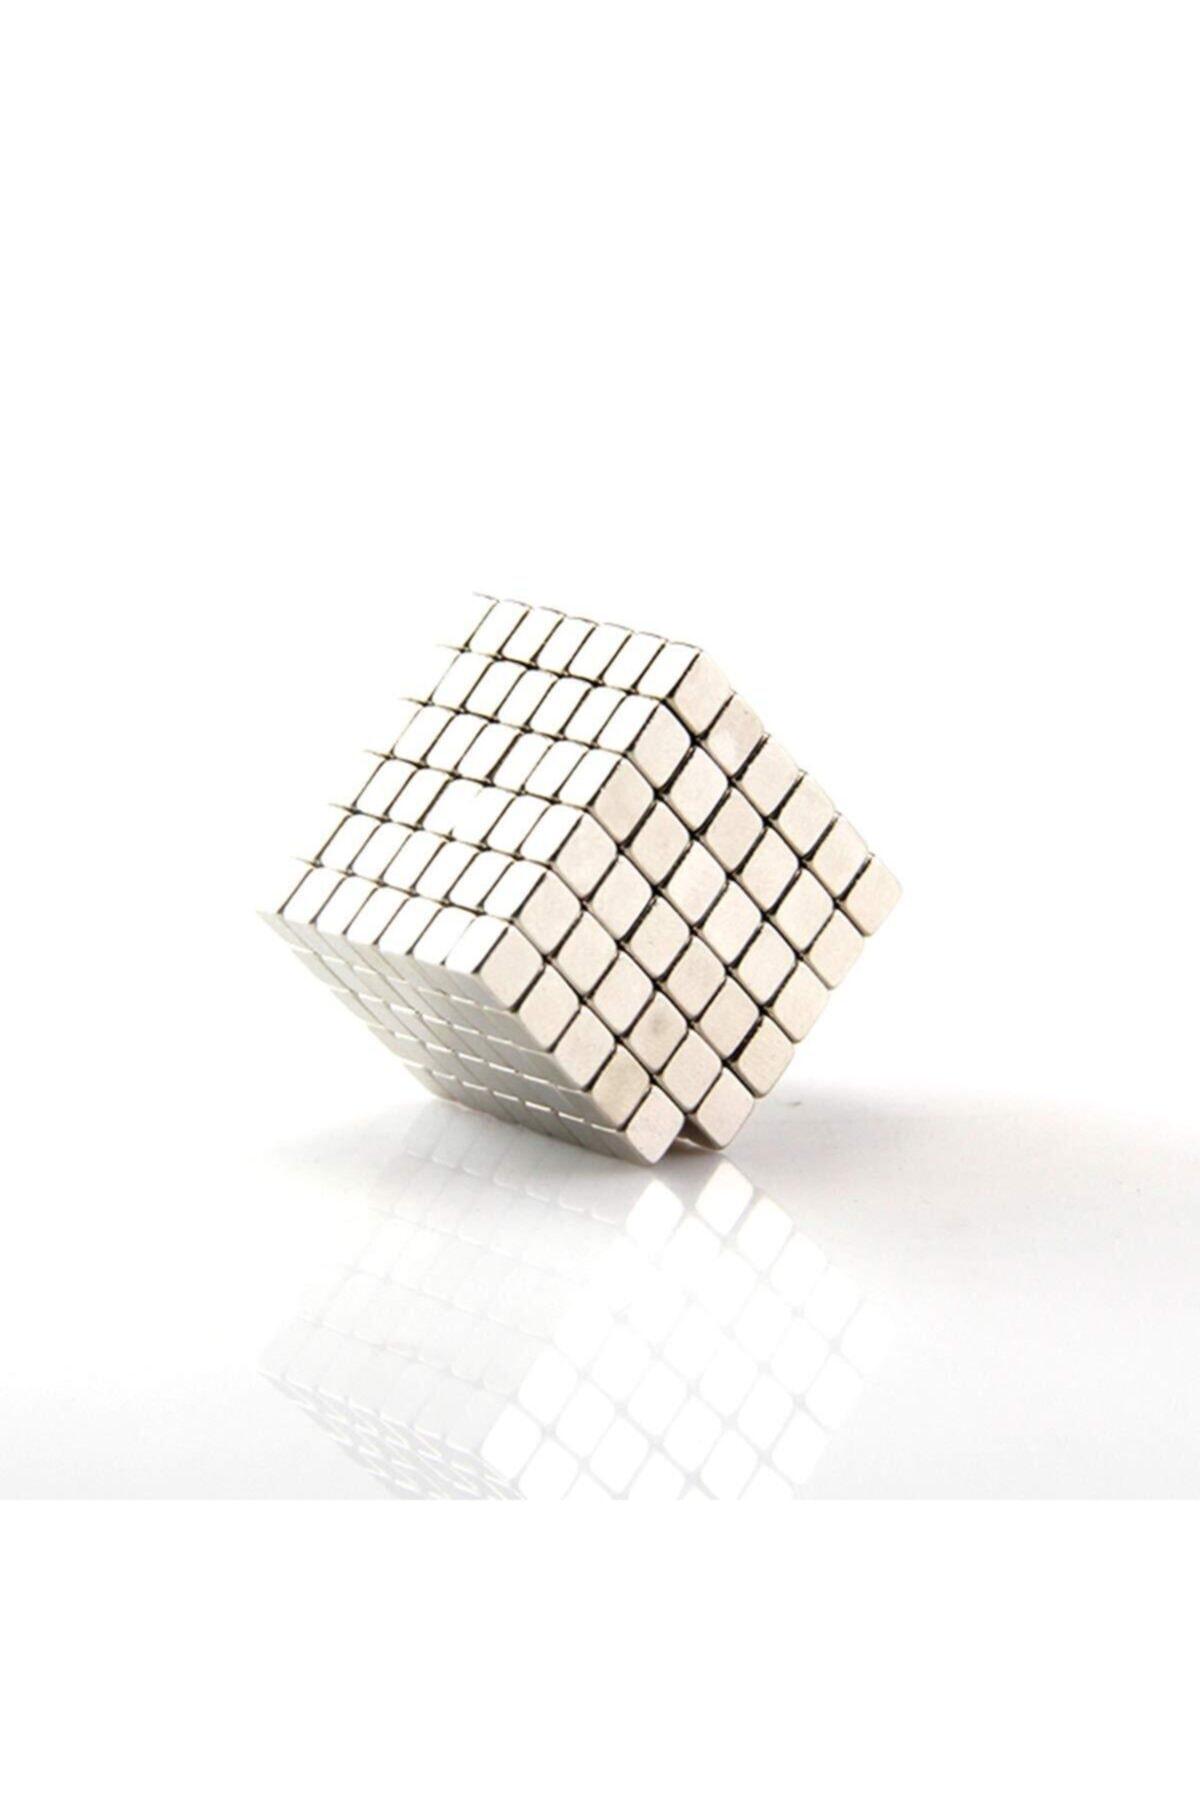 Dünya Magnet 100 Adet 3mm X 3mm X 3mm Küp Neodyum Mıknatıs(100'lü Paket) 2